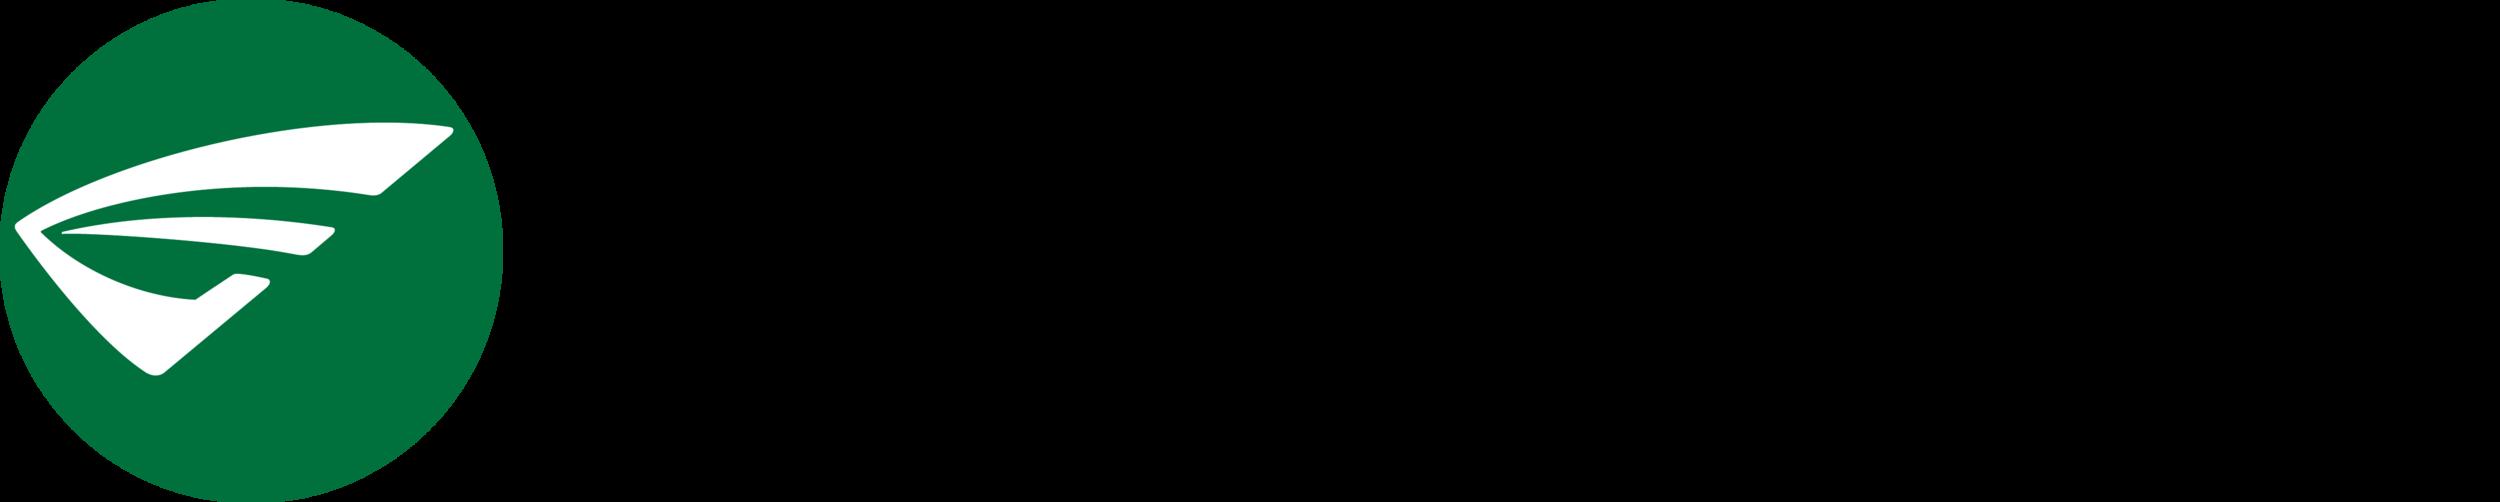 greenballinhouse-logocopy.png